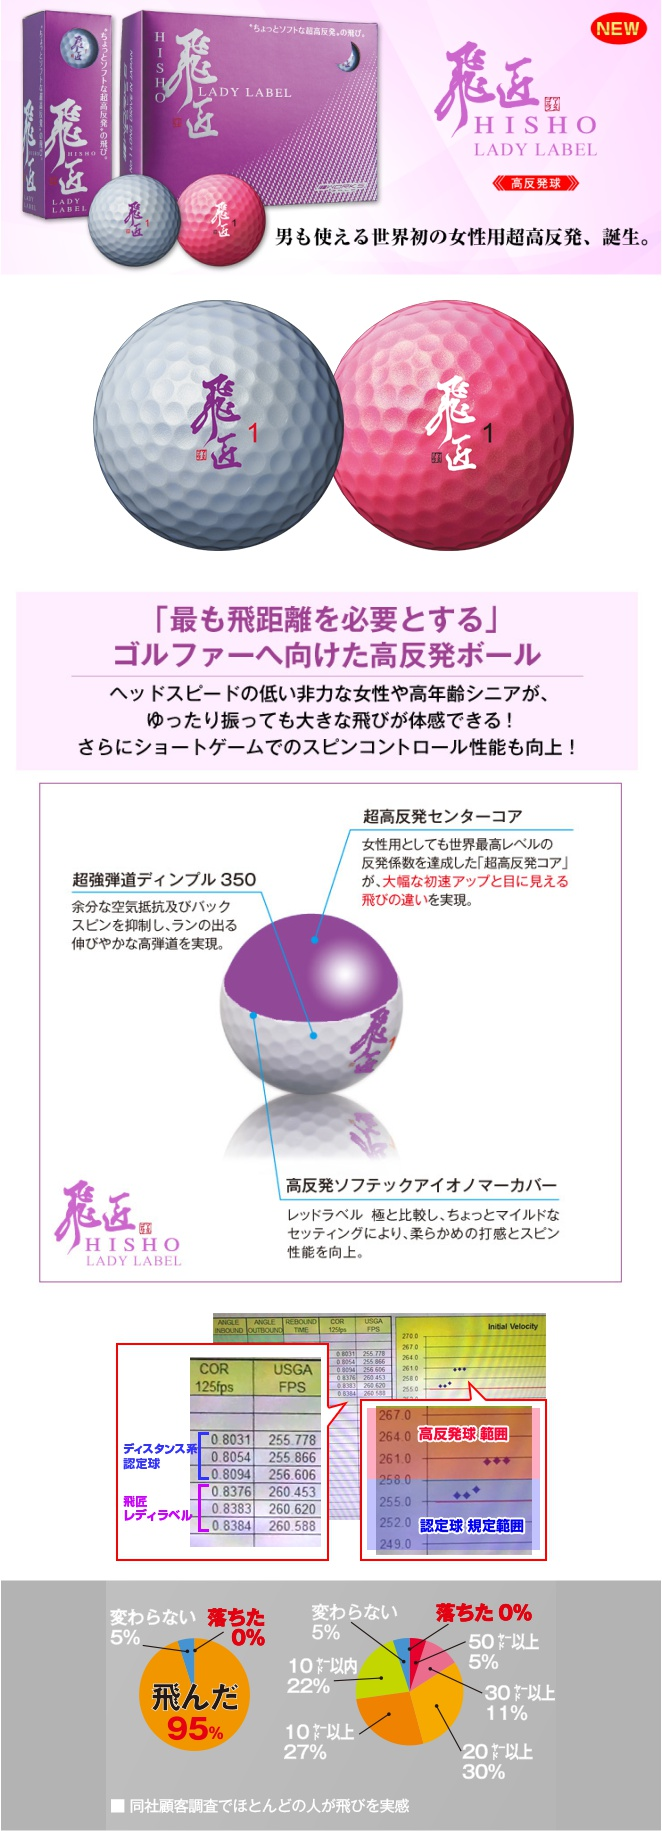 Hisho Non Conforming Kiwami Lady Label Ball